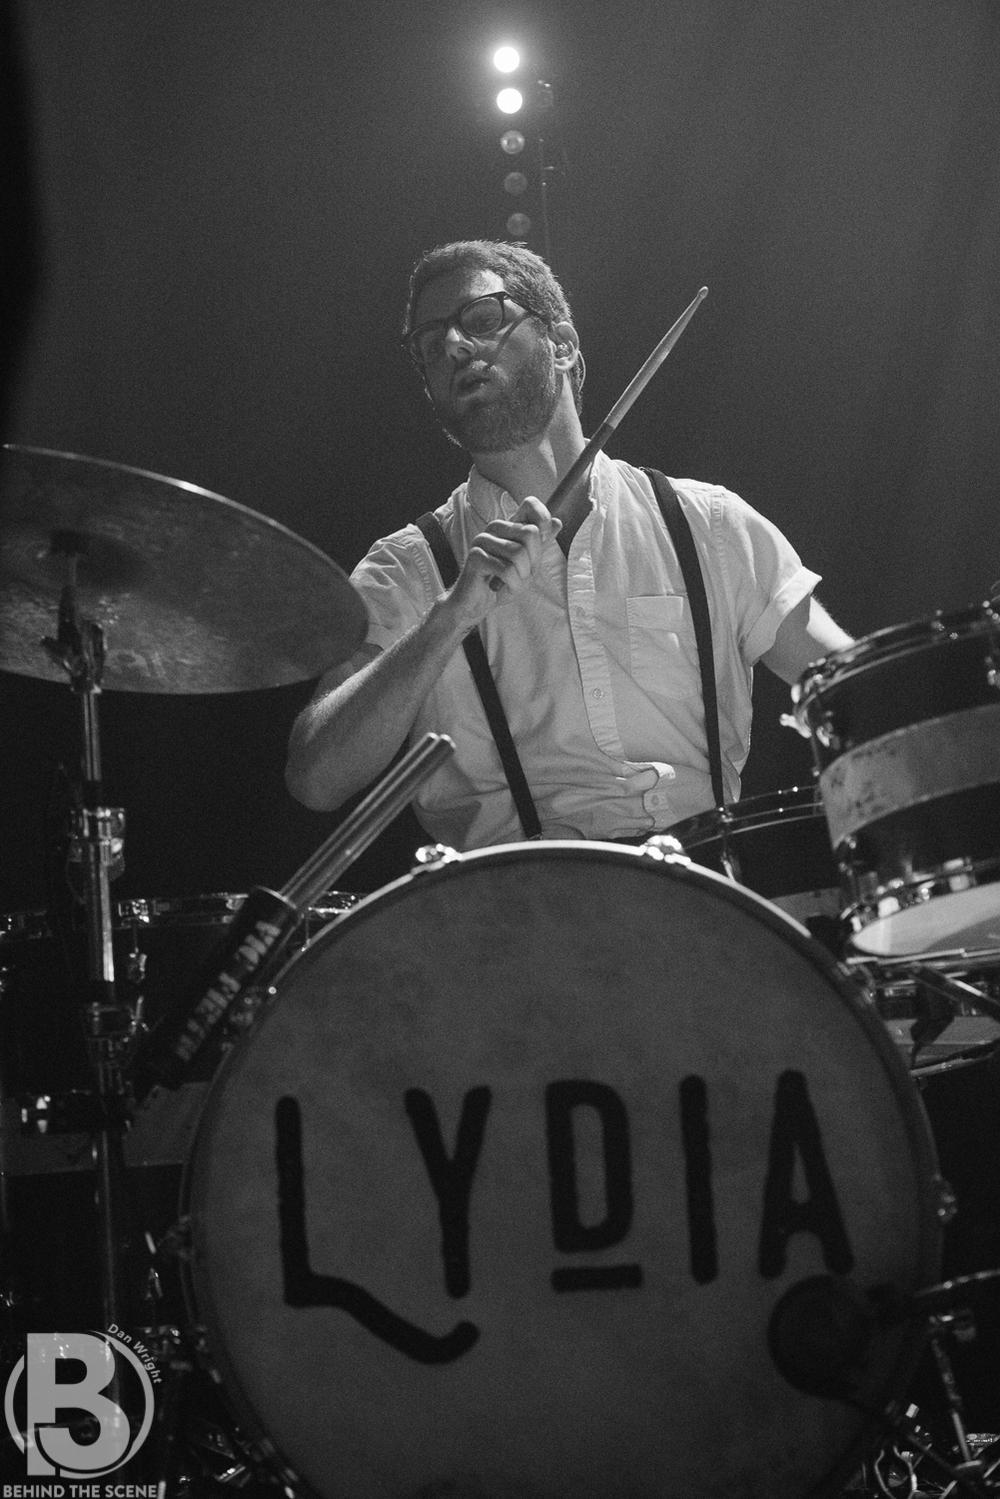 Lydia-8.jpg